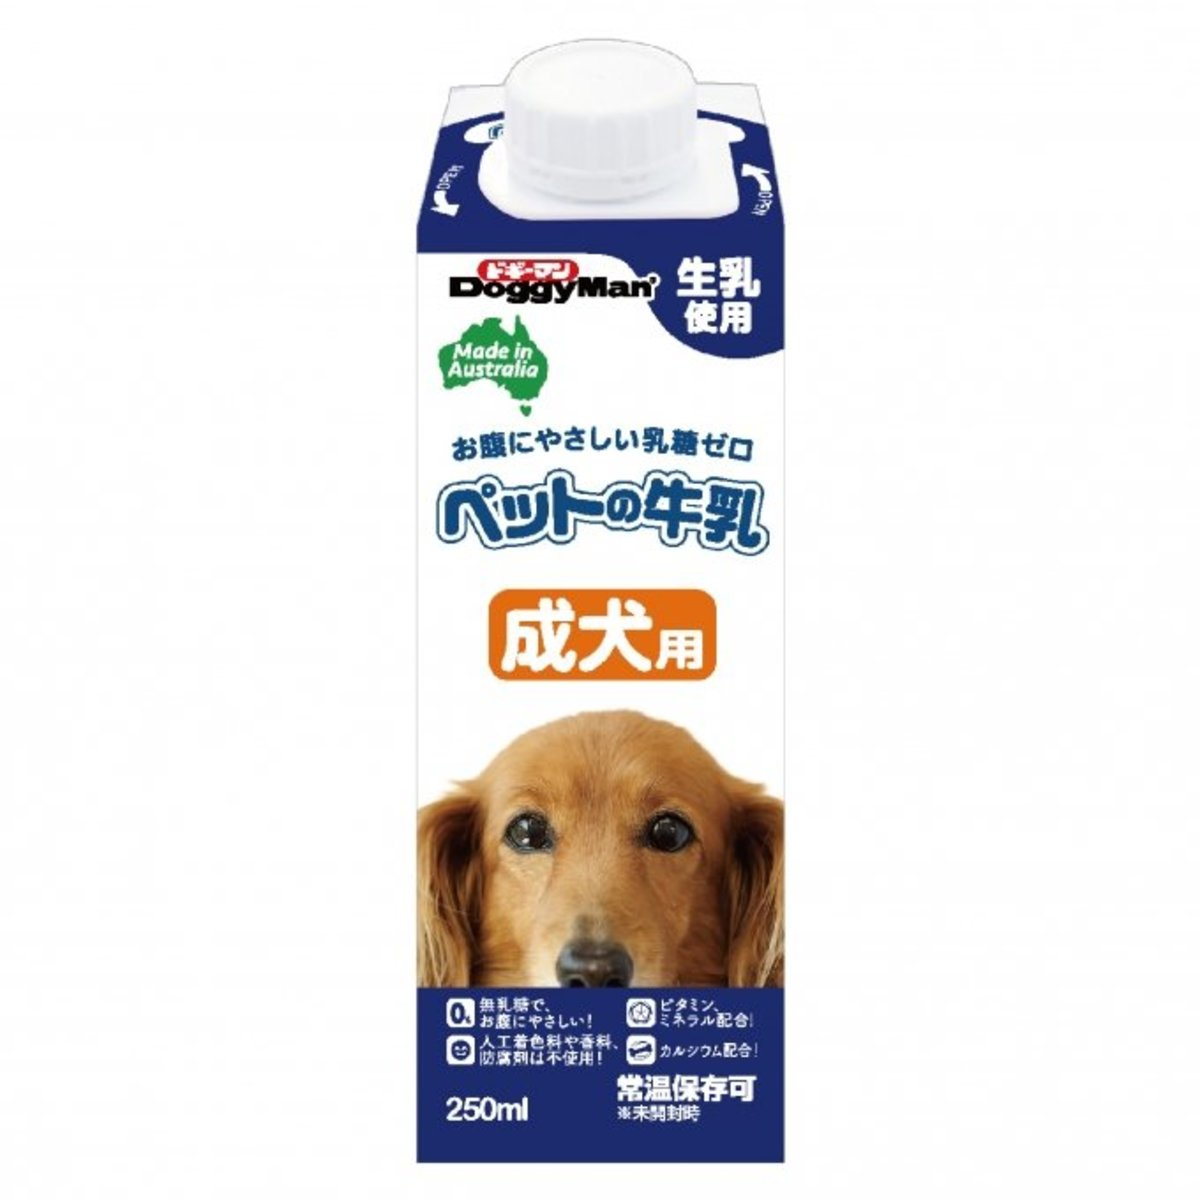 Australian Doggy Milk (250ml) #1030